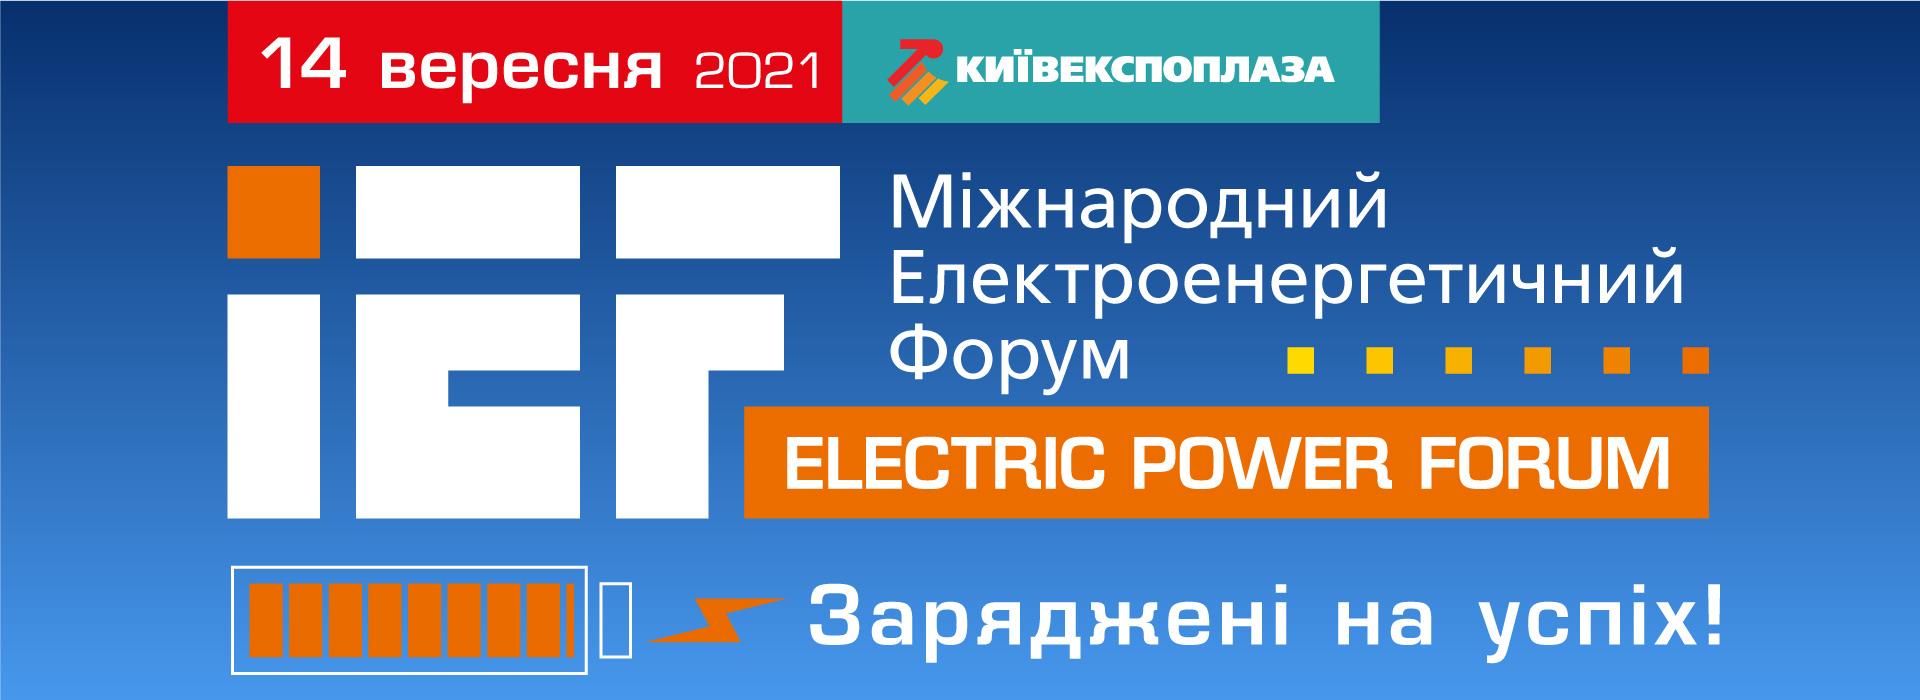 Electric Power Forum